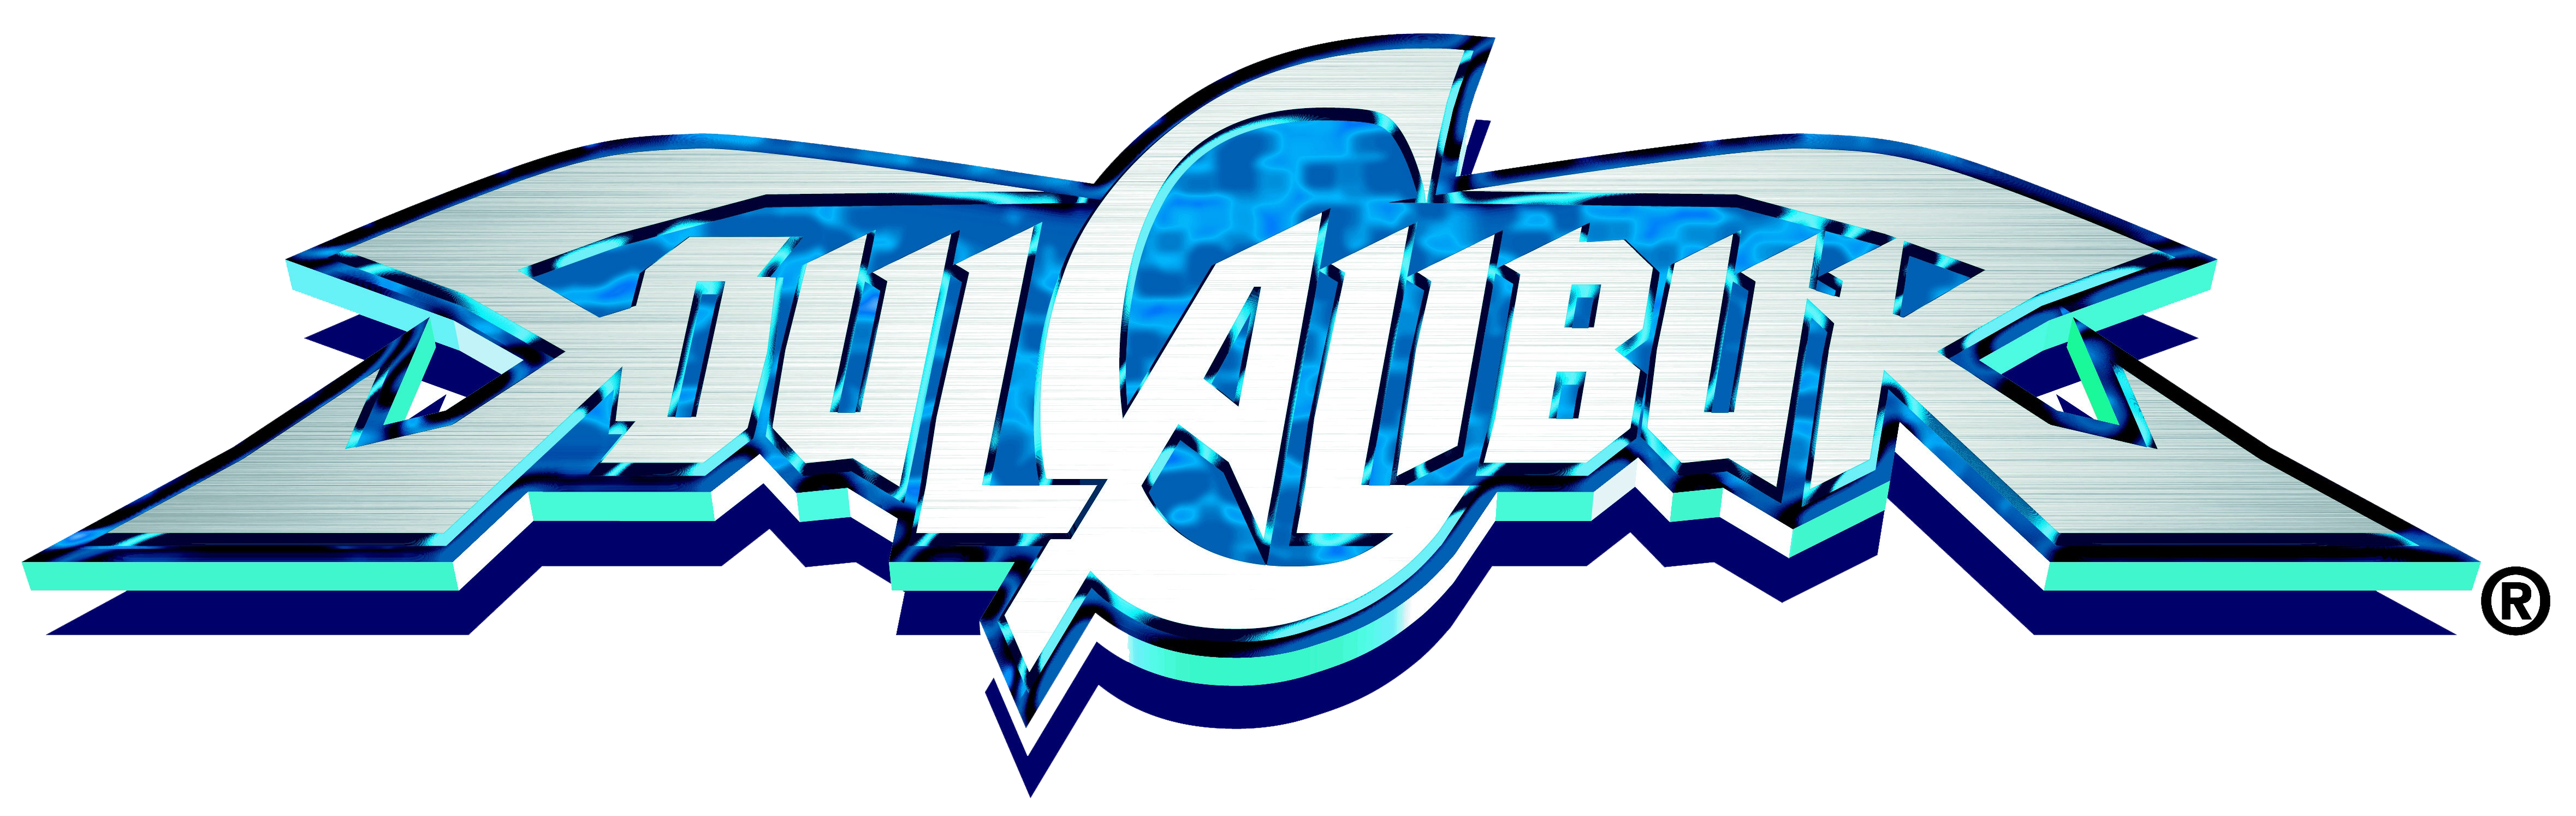 Darth vader clipart soul calibur iv. Series crossover wiki fandom